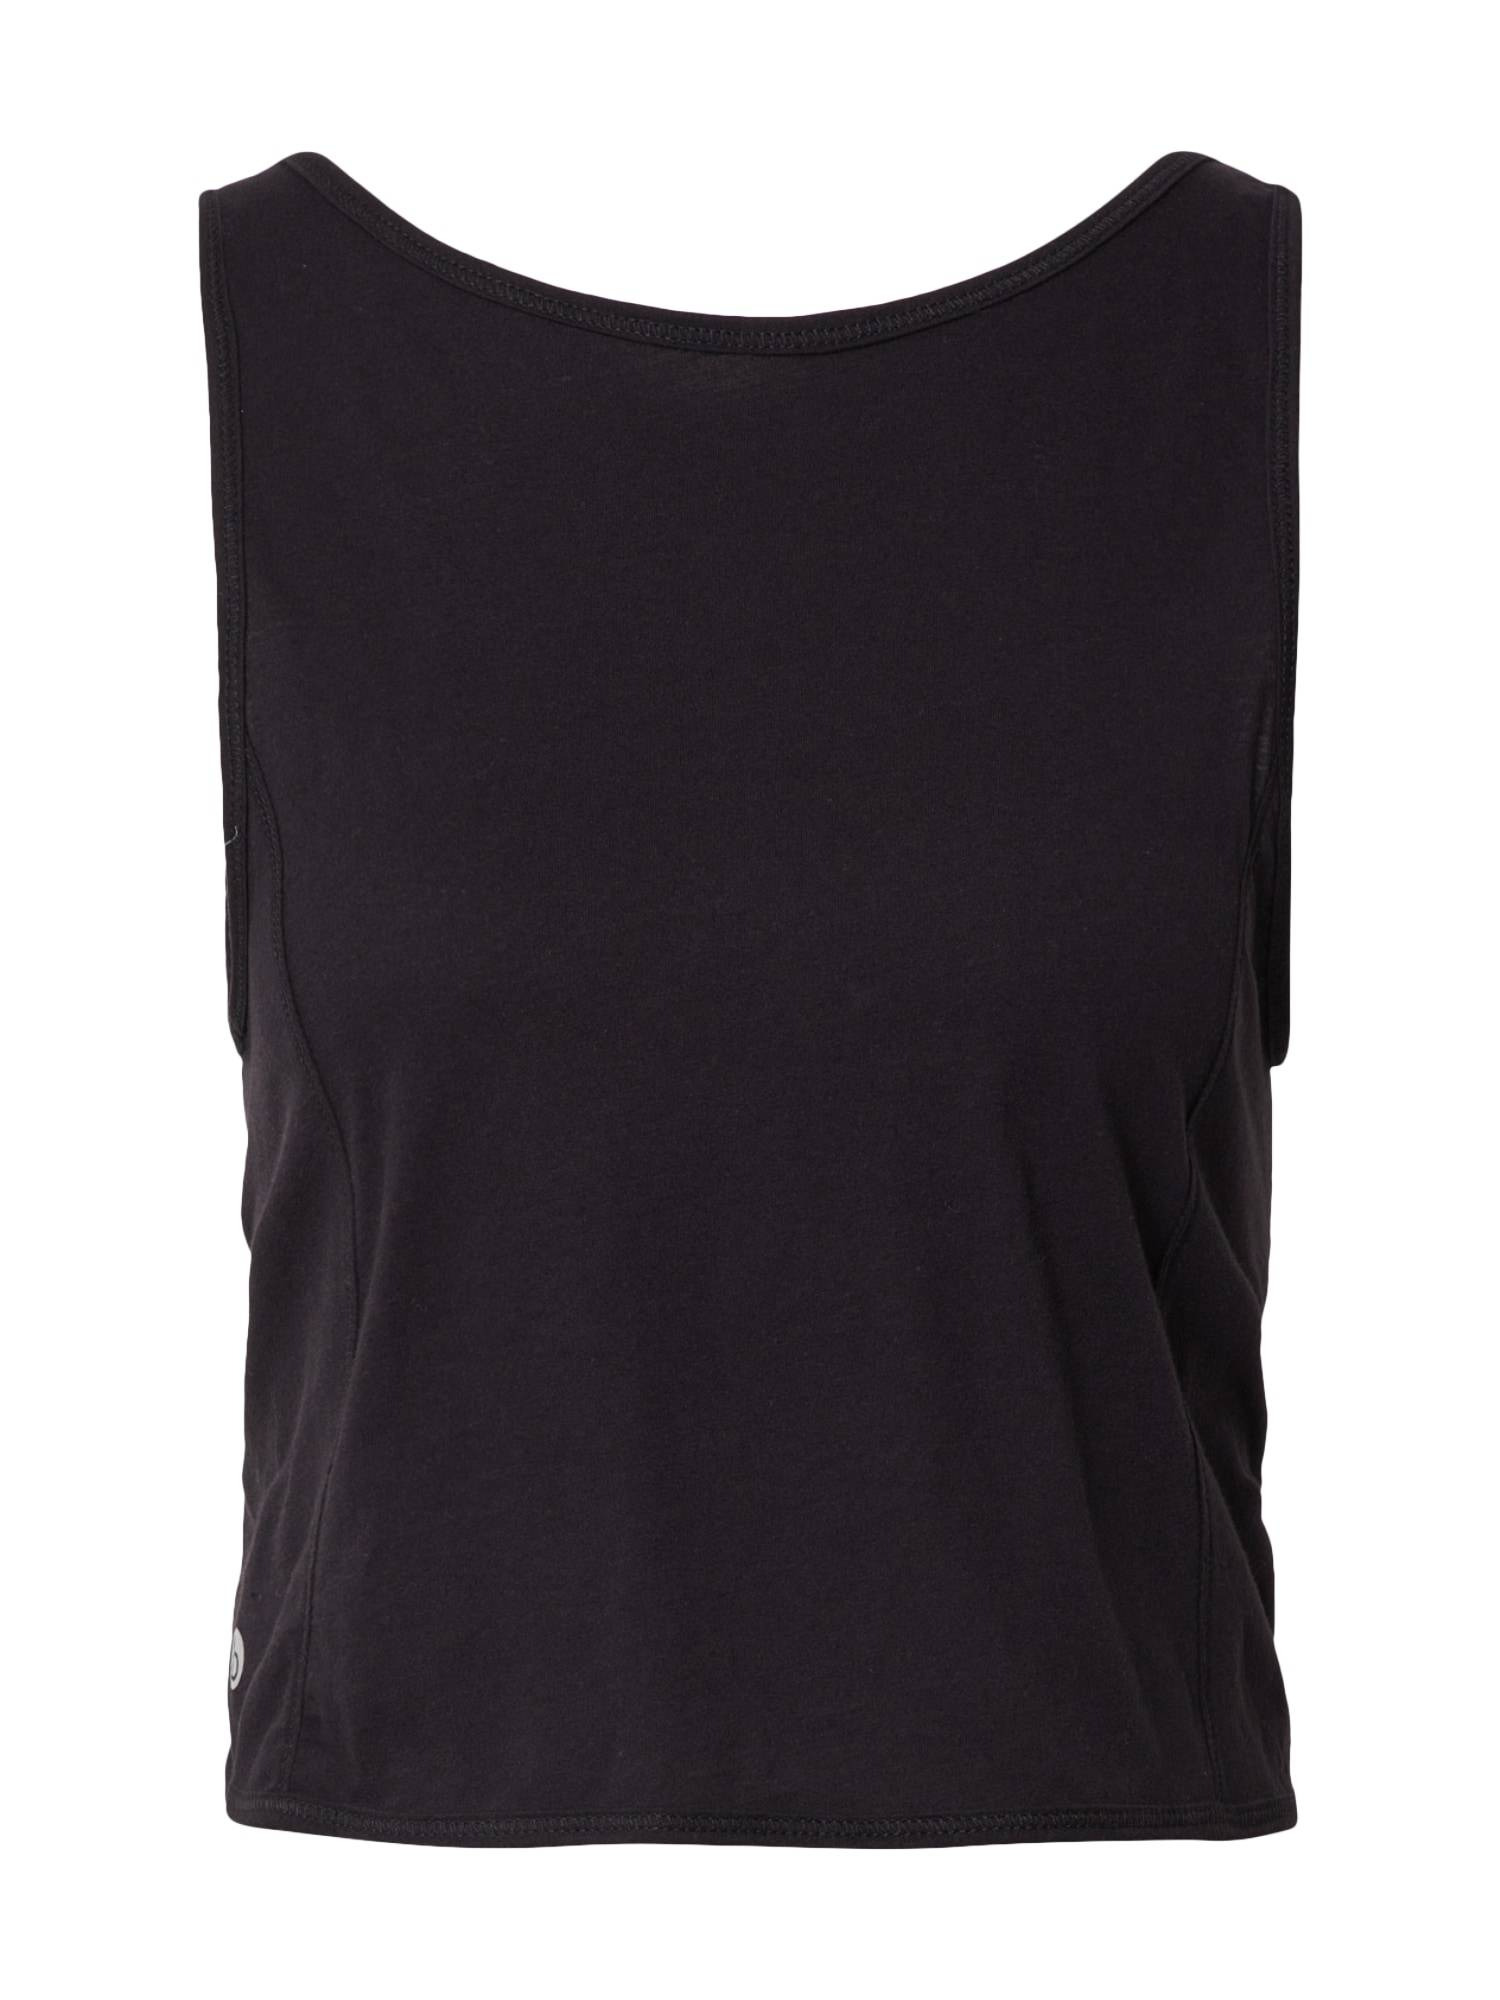 Cotton On Haut 'ON THE GO'  - Noir - Taille: XS - female